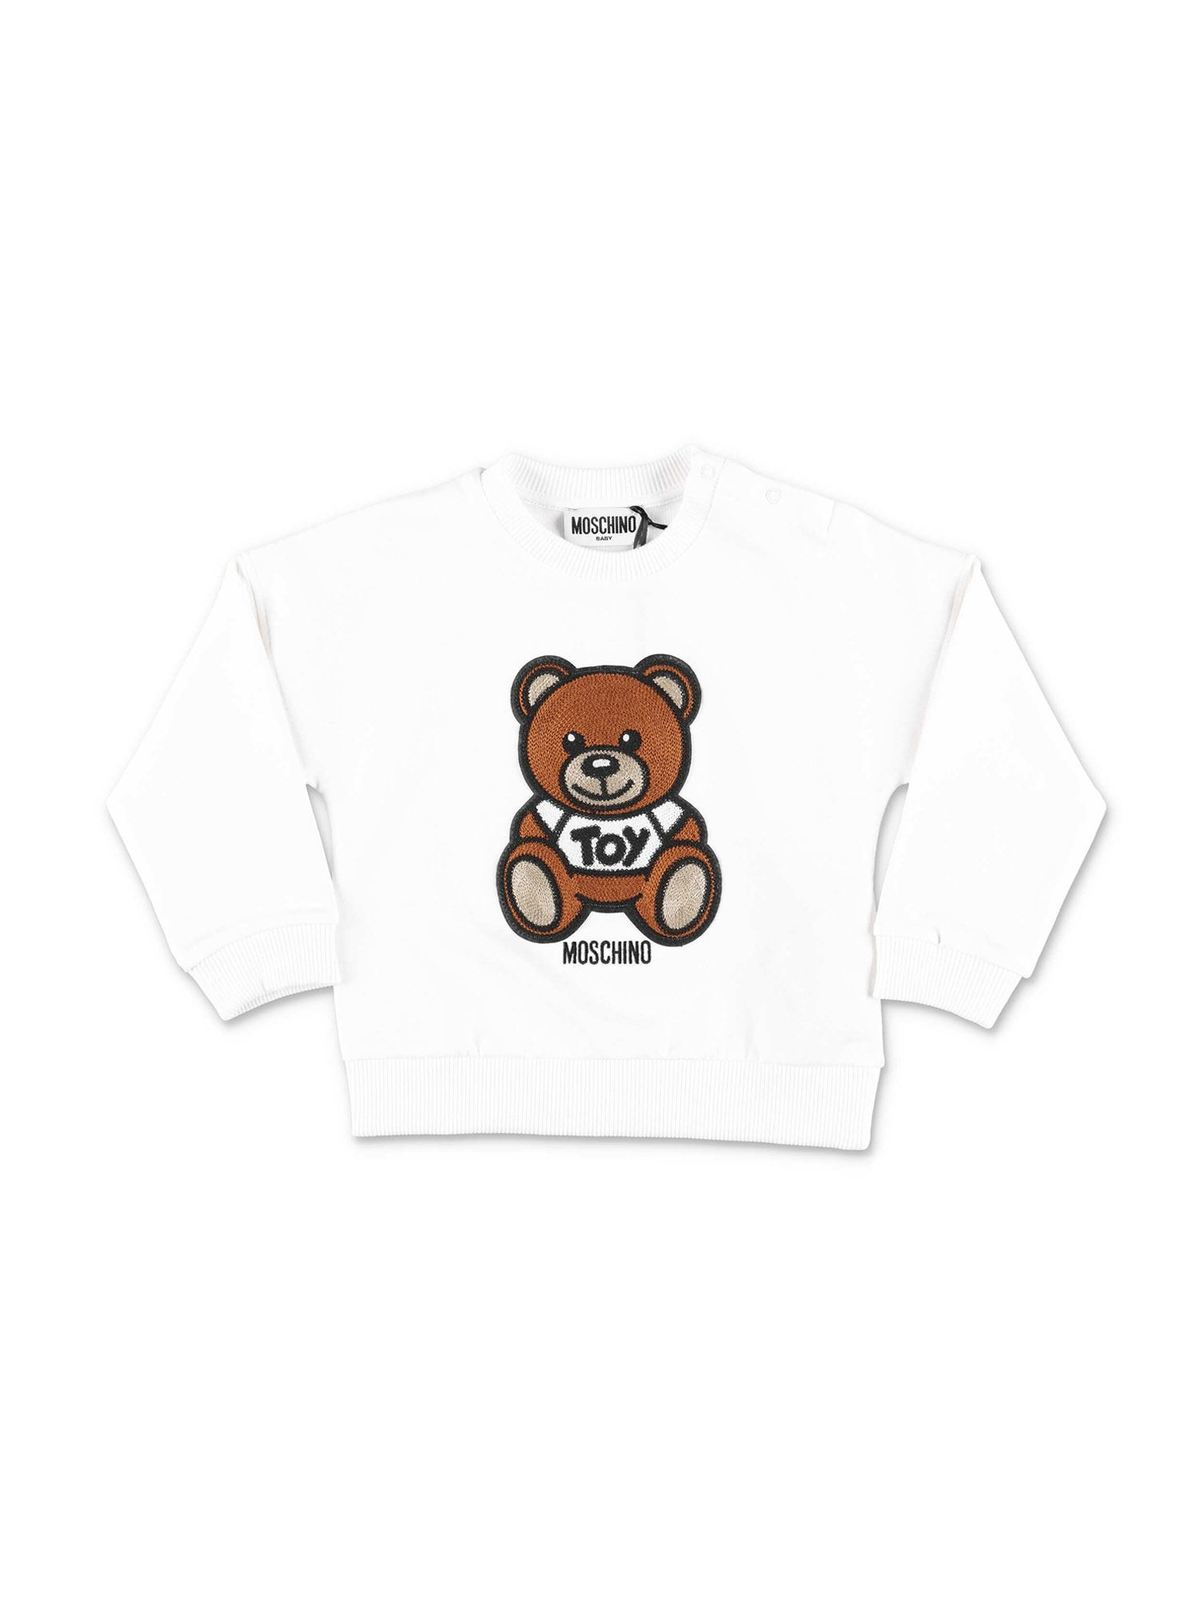 Moschino TEDDY BEAR SWEATSHIRT IN WHITE